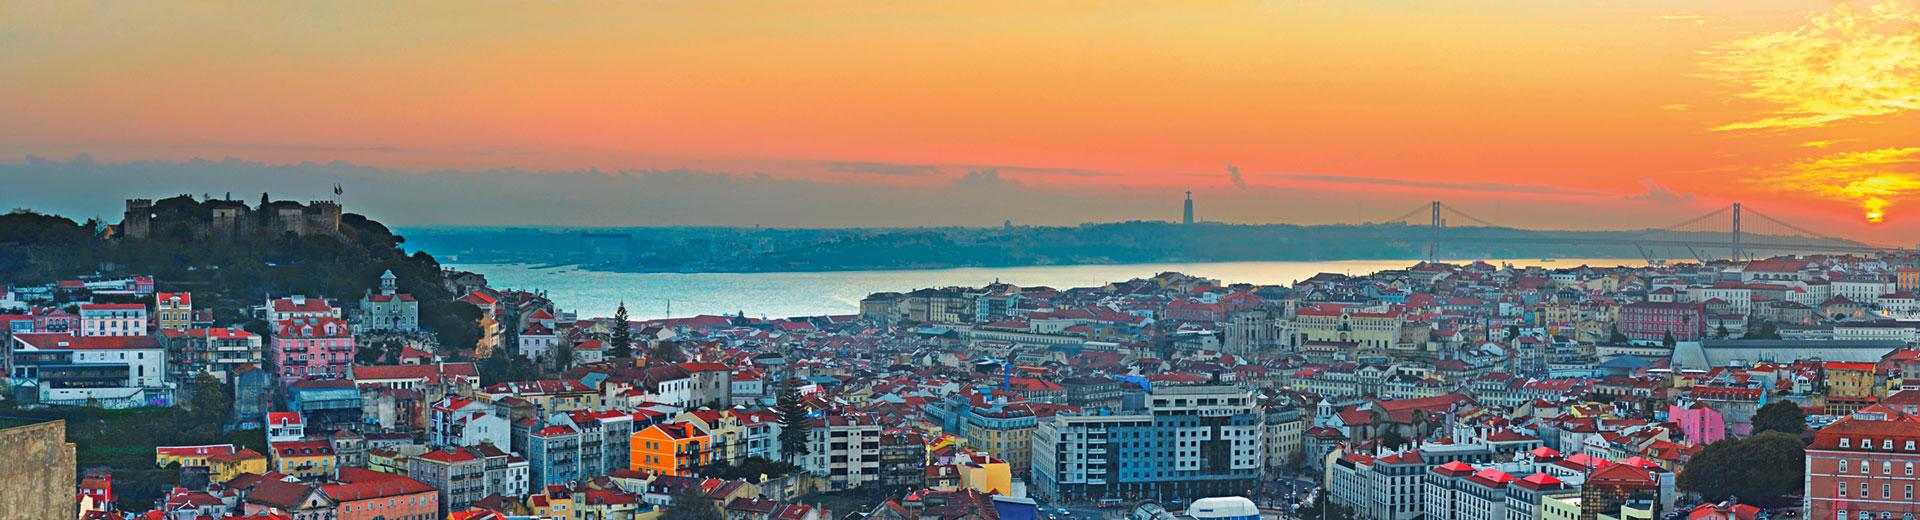 Voyages en groupe Lisbonne - offre confort avion